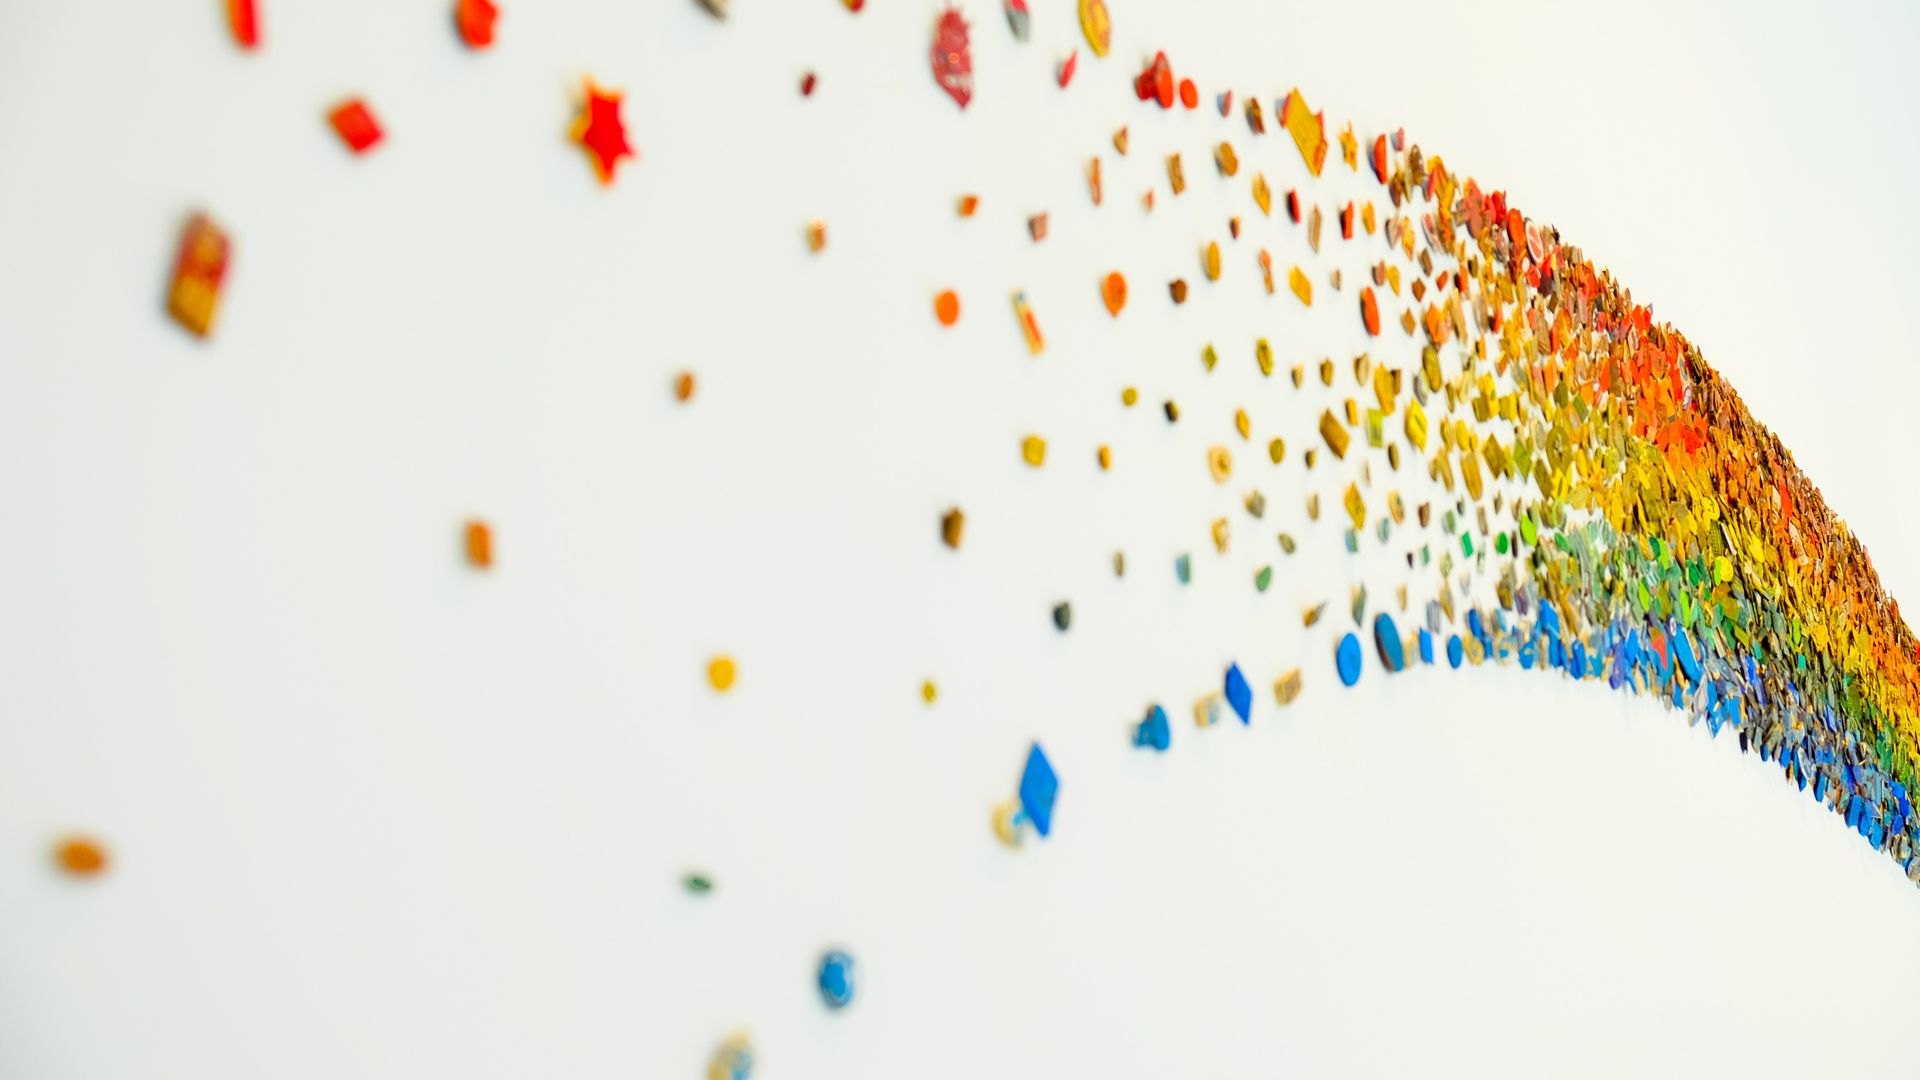 Abstract Art Rainbow Decoration Artistic Wallpaper Artistic 1920x1080 Wallpaper Teahub Io